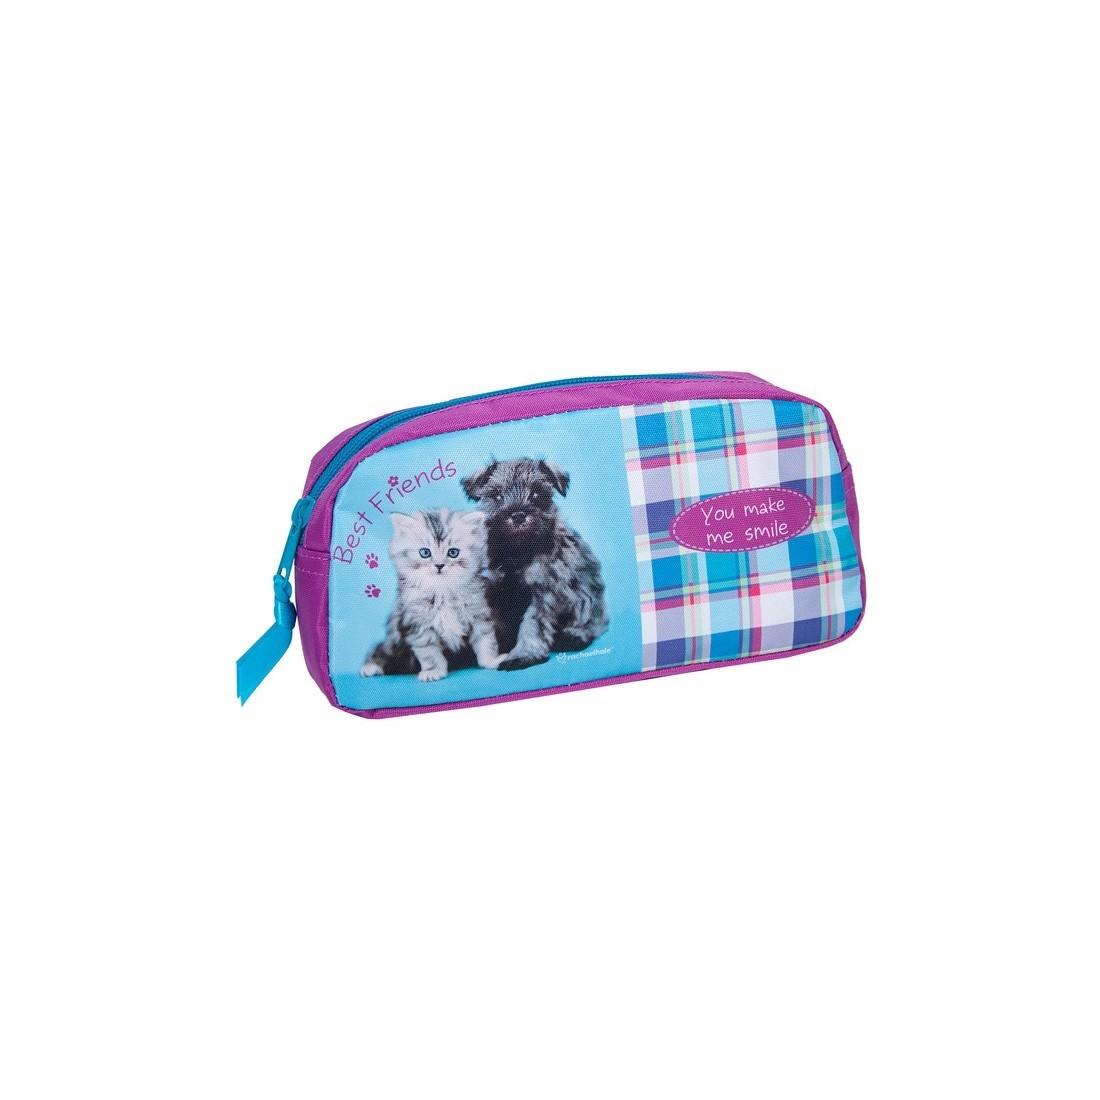 Saszetka Rachael Hale z psem i kotem - plecak-tornister.pl